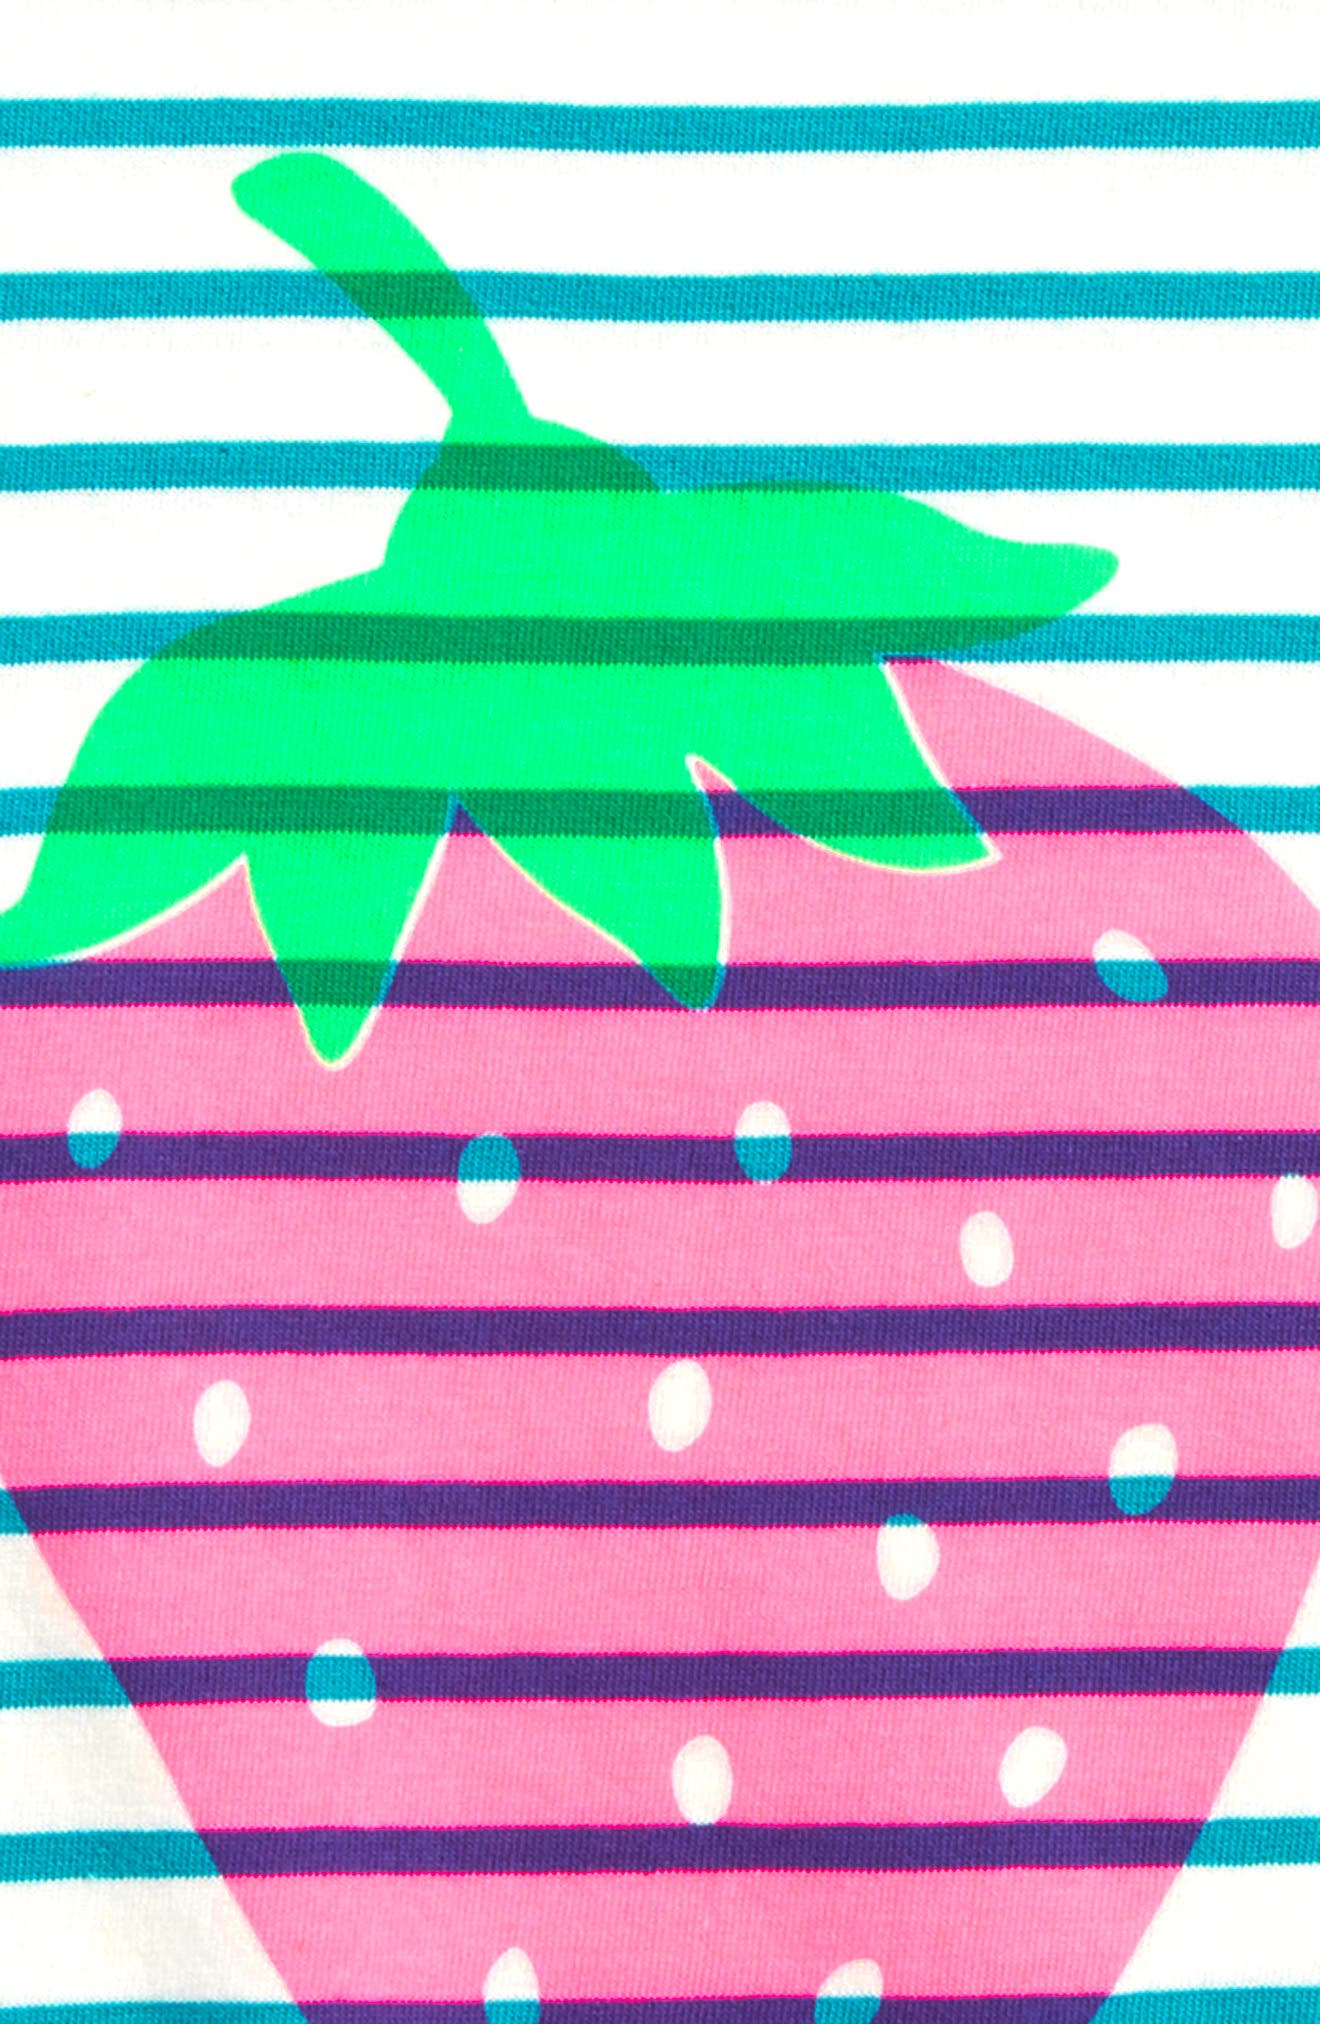 Bright Strawberry Tee,                             Alternate thumbnail 2, color,                             Ivory/ Ultramarine Green Grn